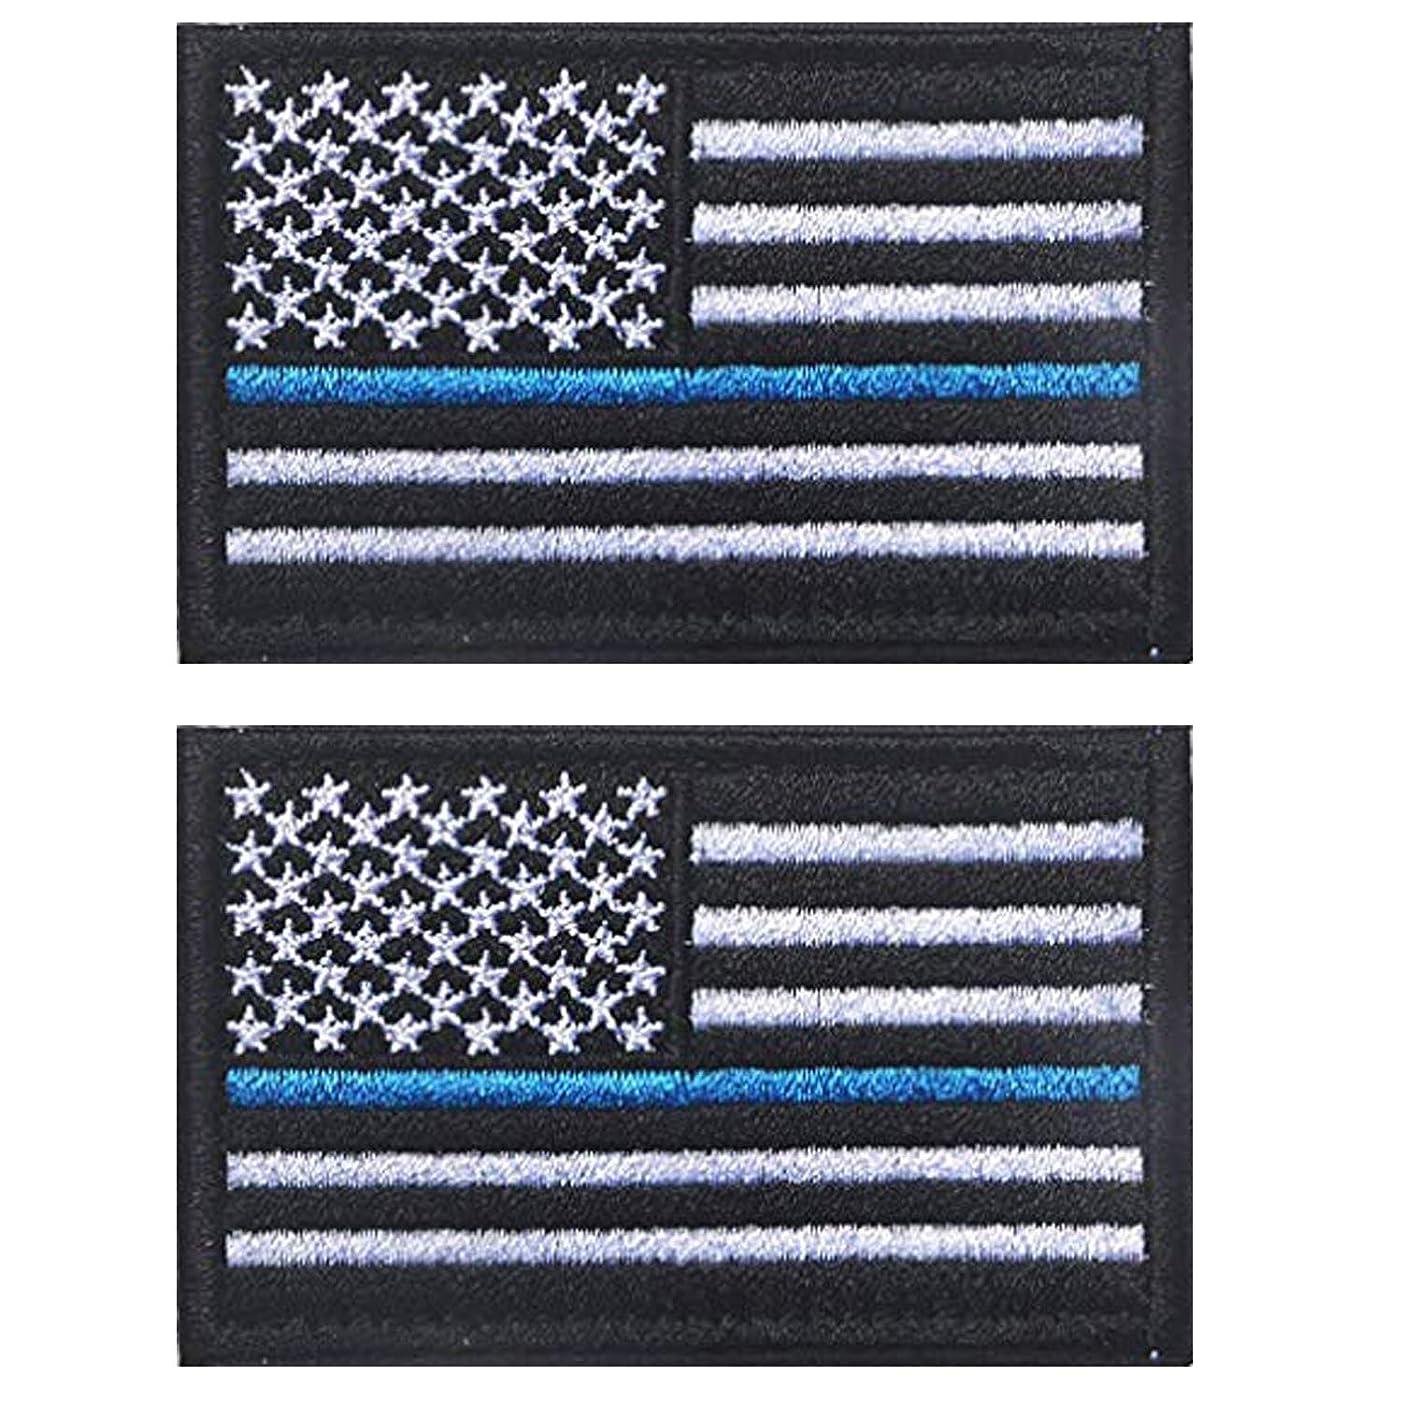 ShowPlus American USA US Flag Patch Military Embroidered Tactical Patches Morale Shoulder Applique (Black & White Blue Line 2pcs)